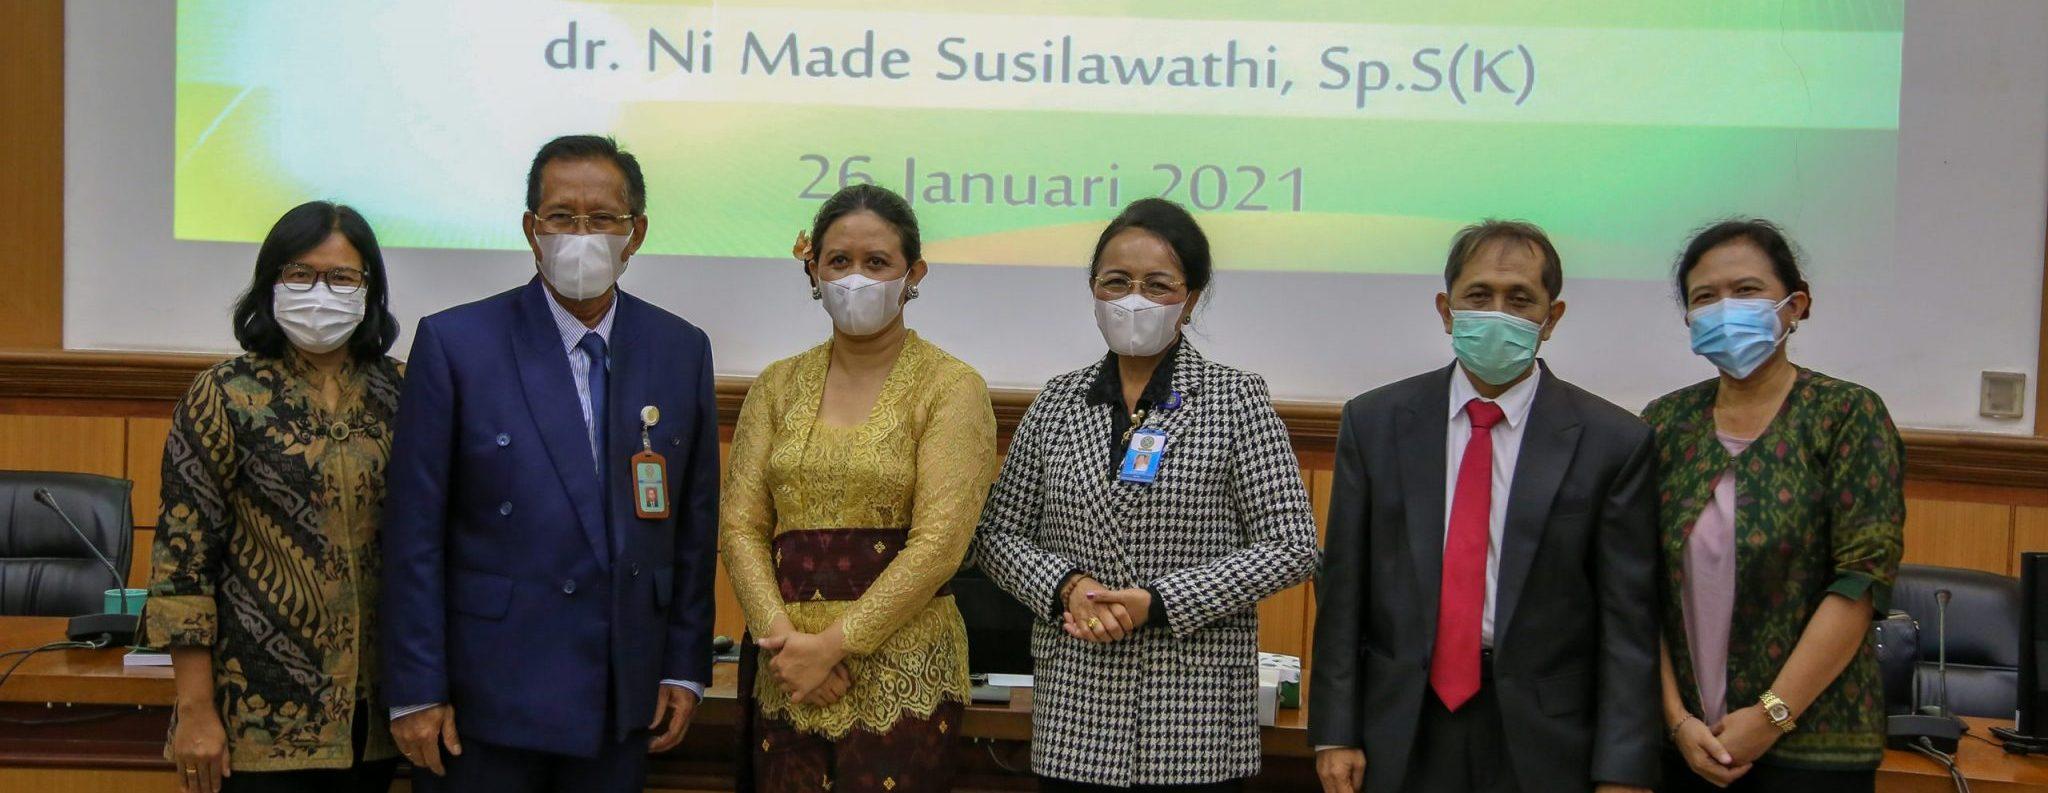 Ujian Terbuka Program Doktor dr. Ni Made Susilawathi, Sp.S(K)